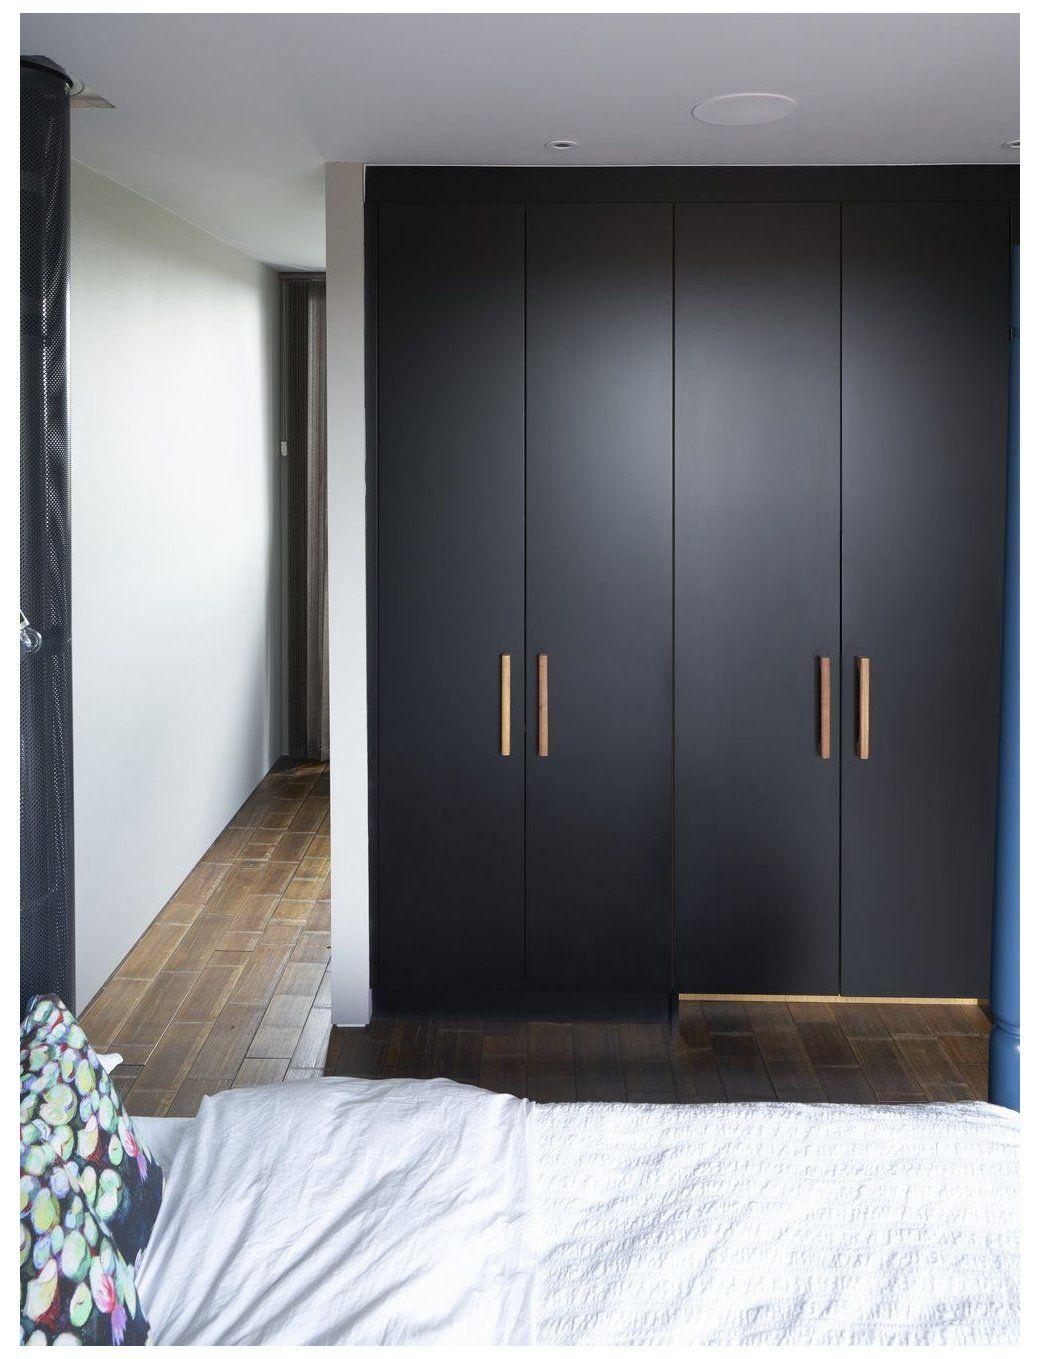 Wardrobe Black Wardrobe Furniture Blackwardrobefurniture In 2021 Wall Wardrobe Design Wardrobe Door Designs Bedroom Closet Design